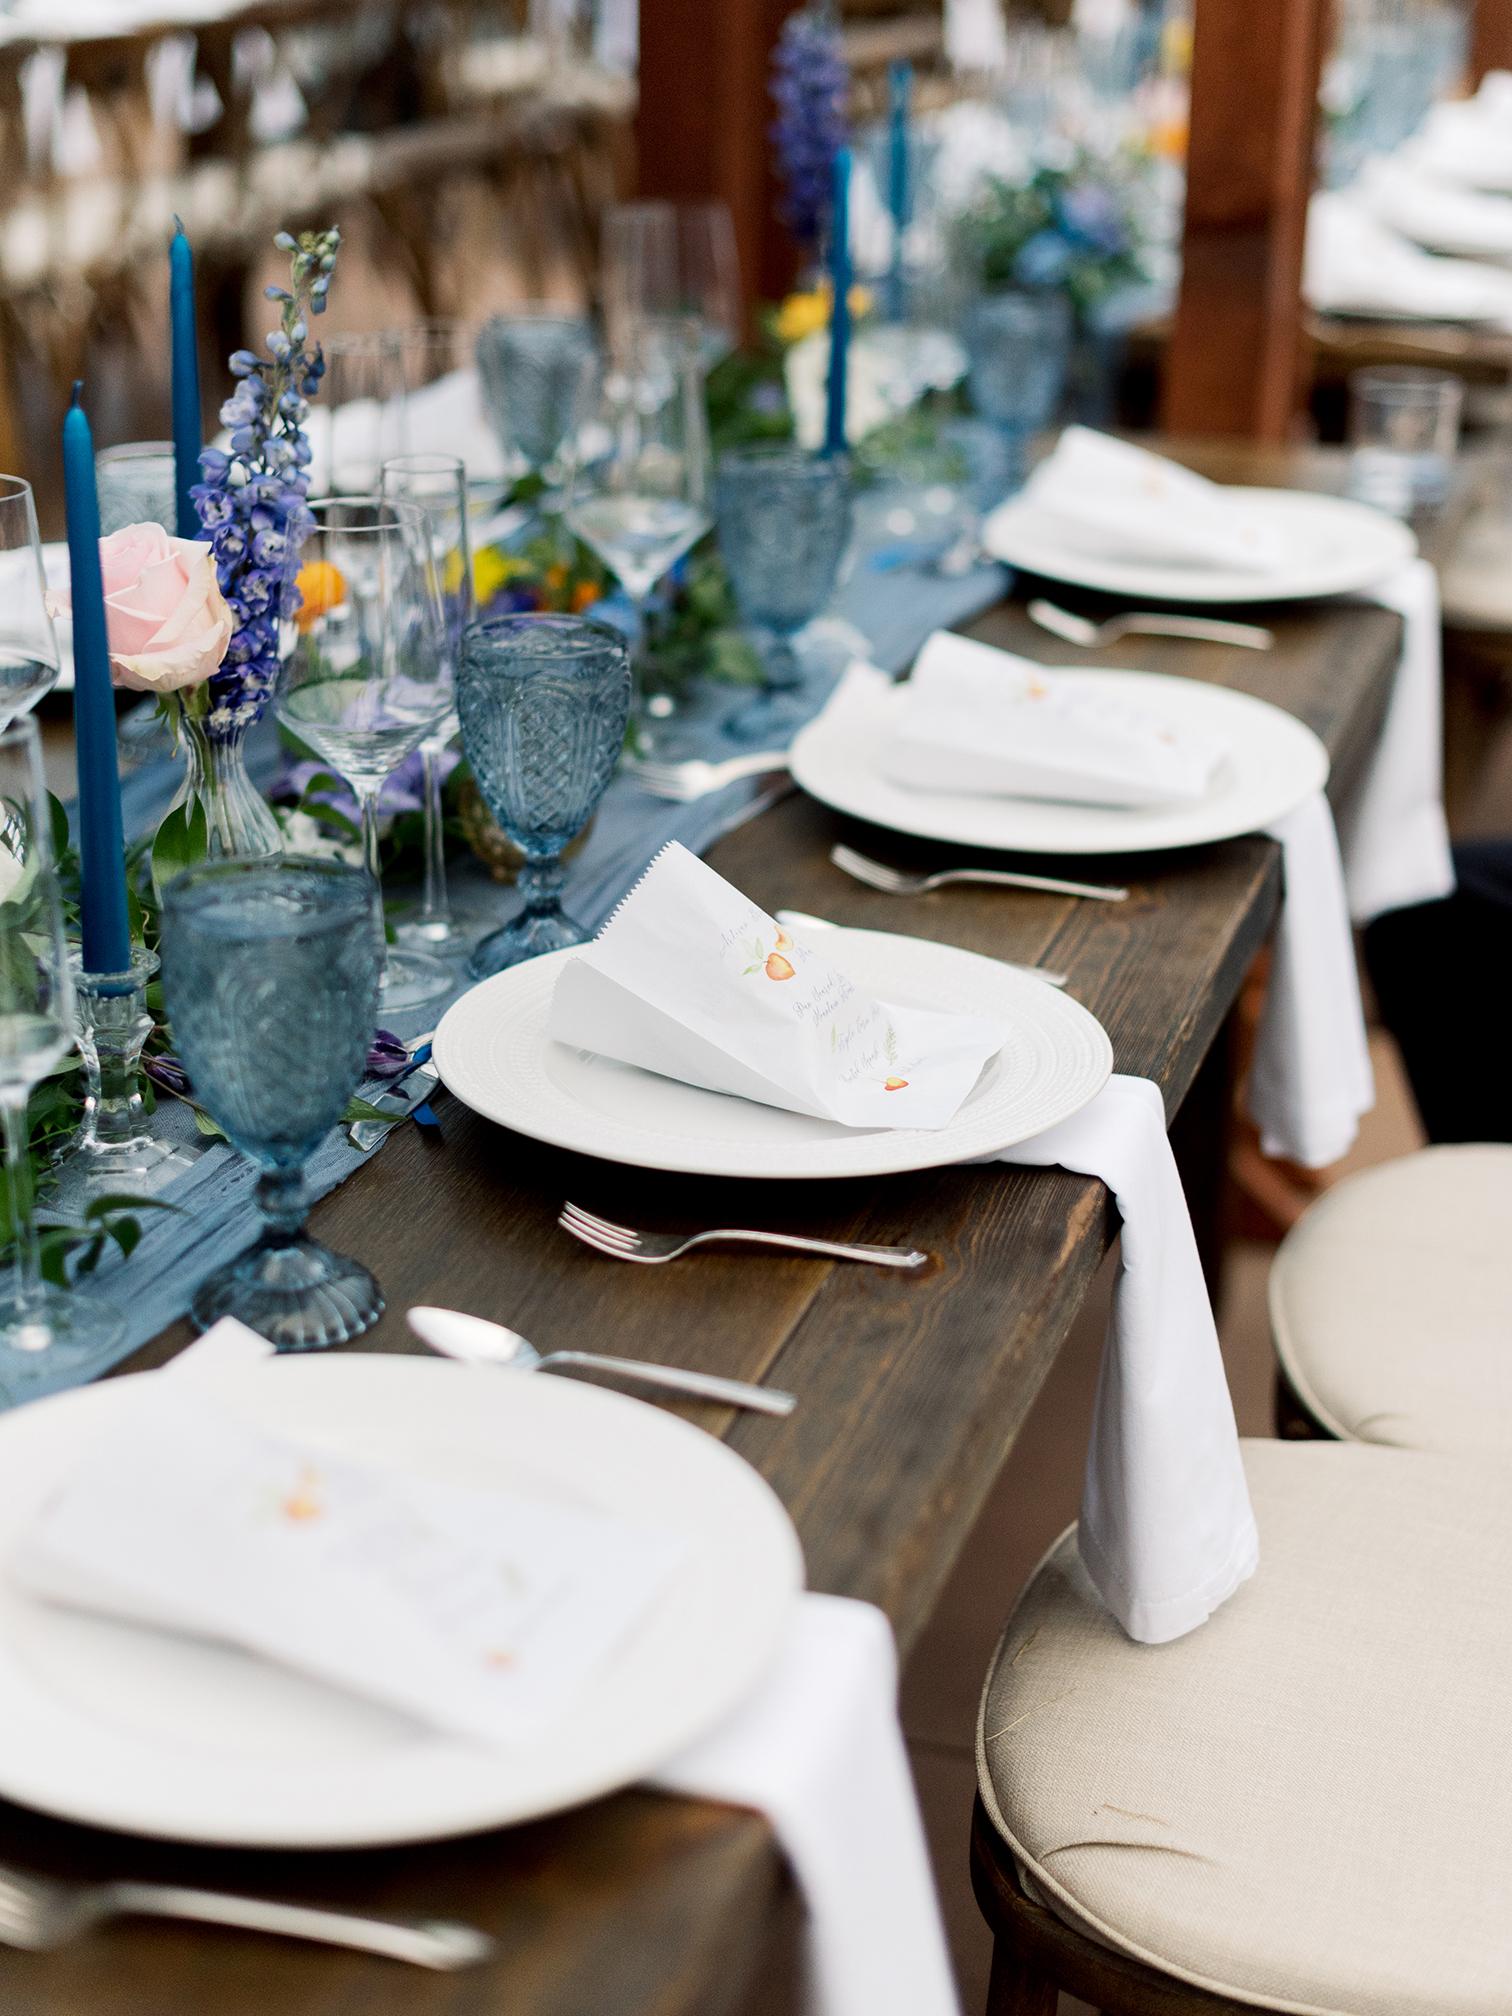 Colorado Wedding Photographers, Custom Stationary, Colorado summer Weddings, Rustic Table Decor